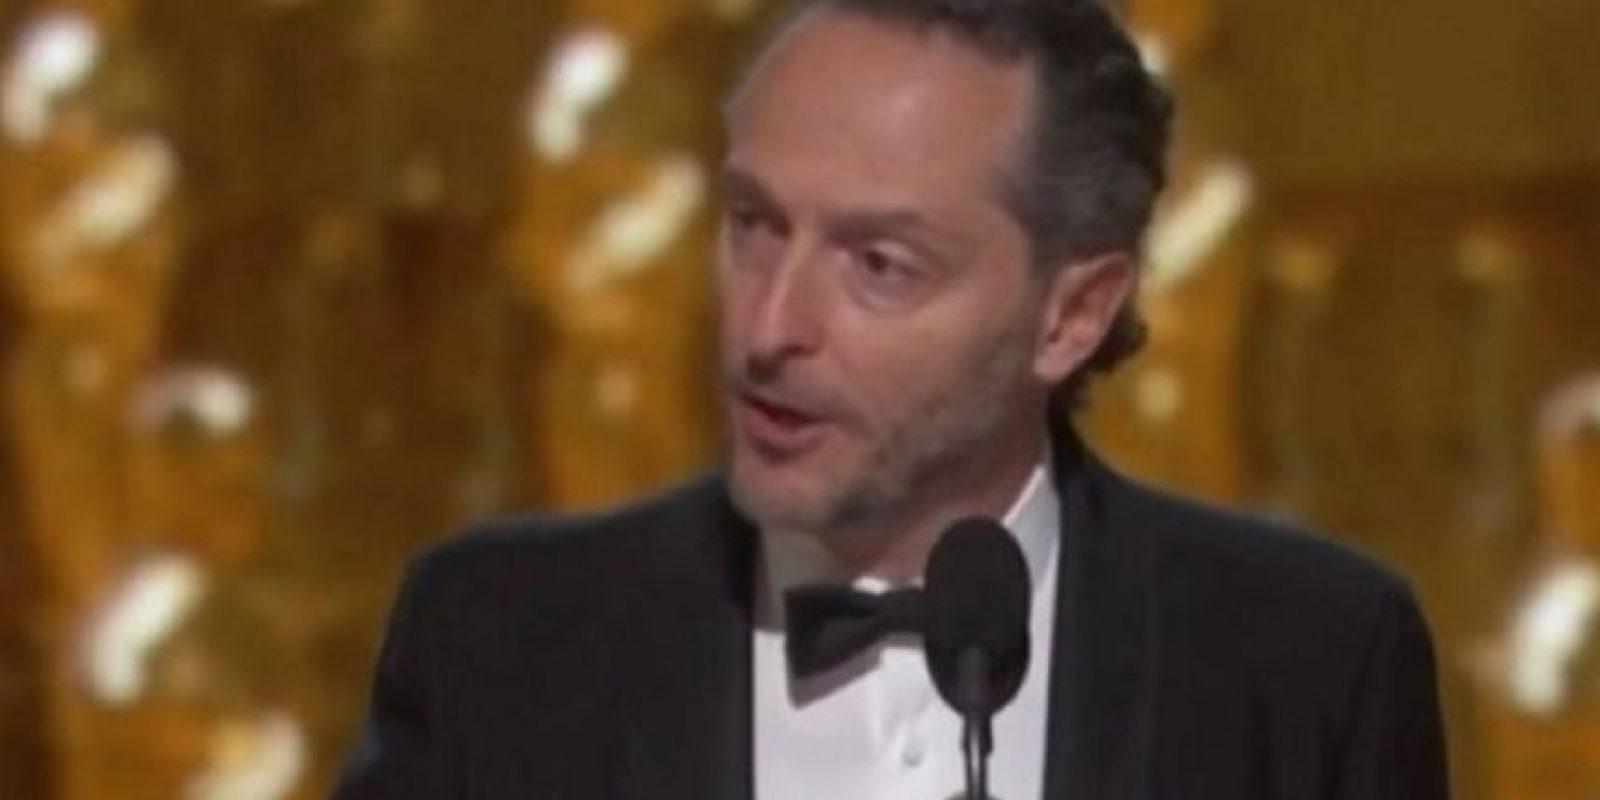 El mexicano Emmanuel Lubezki hizo historia al ser el primer fotógrafo en ganar tres premios Oscar de manera consecutiva. Foto:Vía TNT